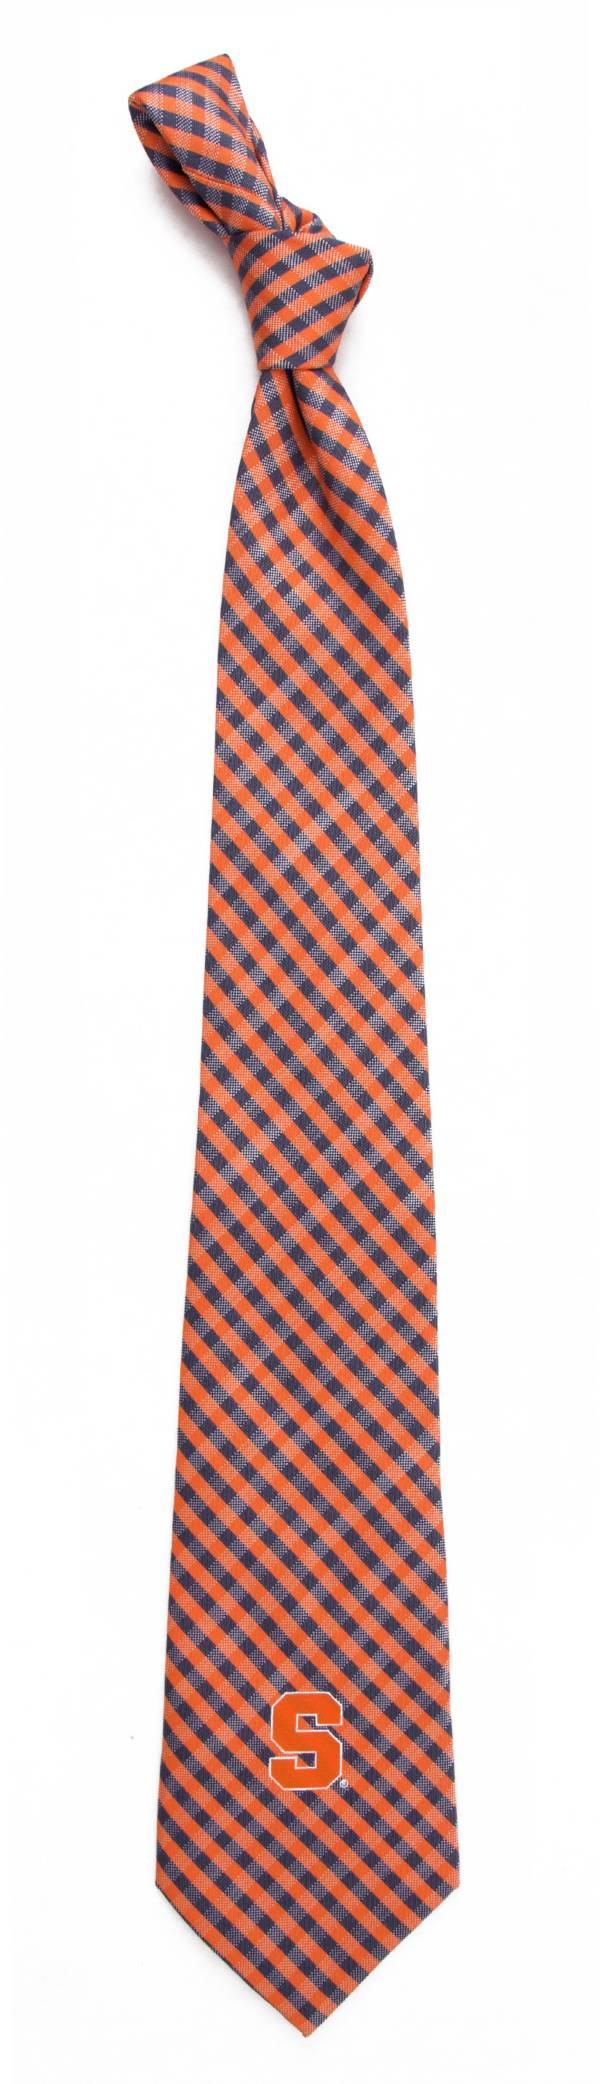 Eagles Wings Syracuse Orange Gingham Necktie product image